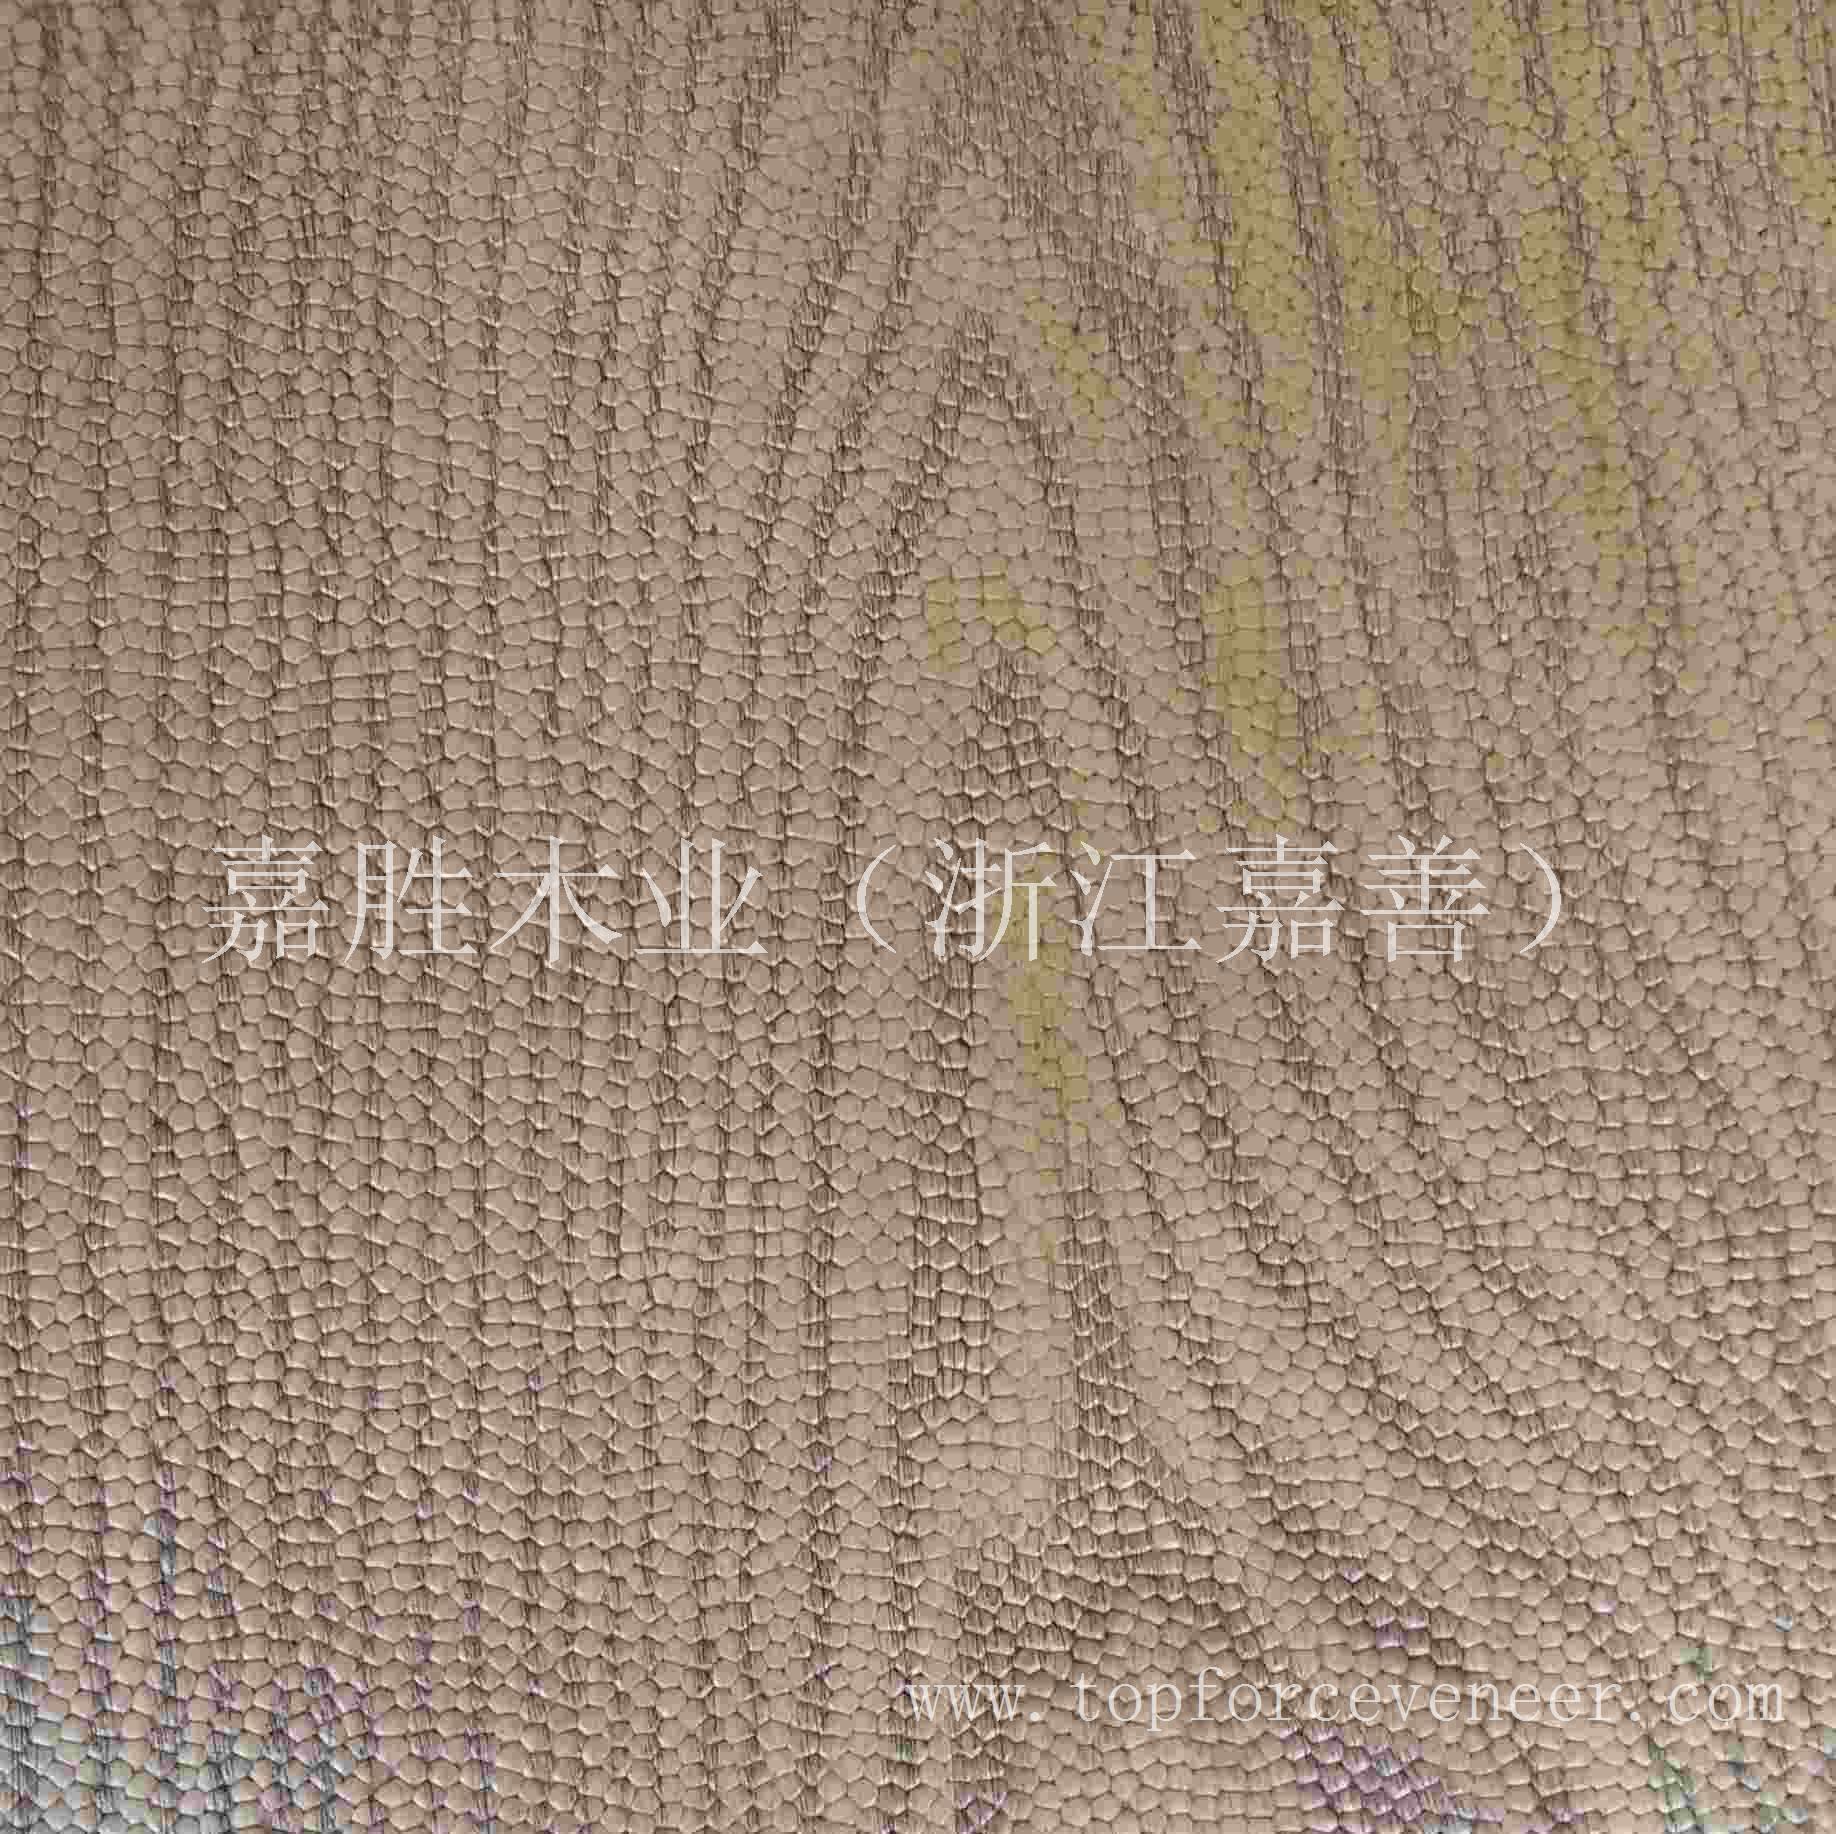 狂野龟壳花 Wild Turtle Shell Pattern Veneer